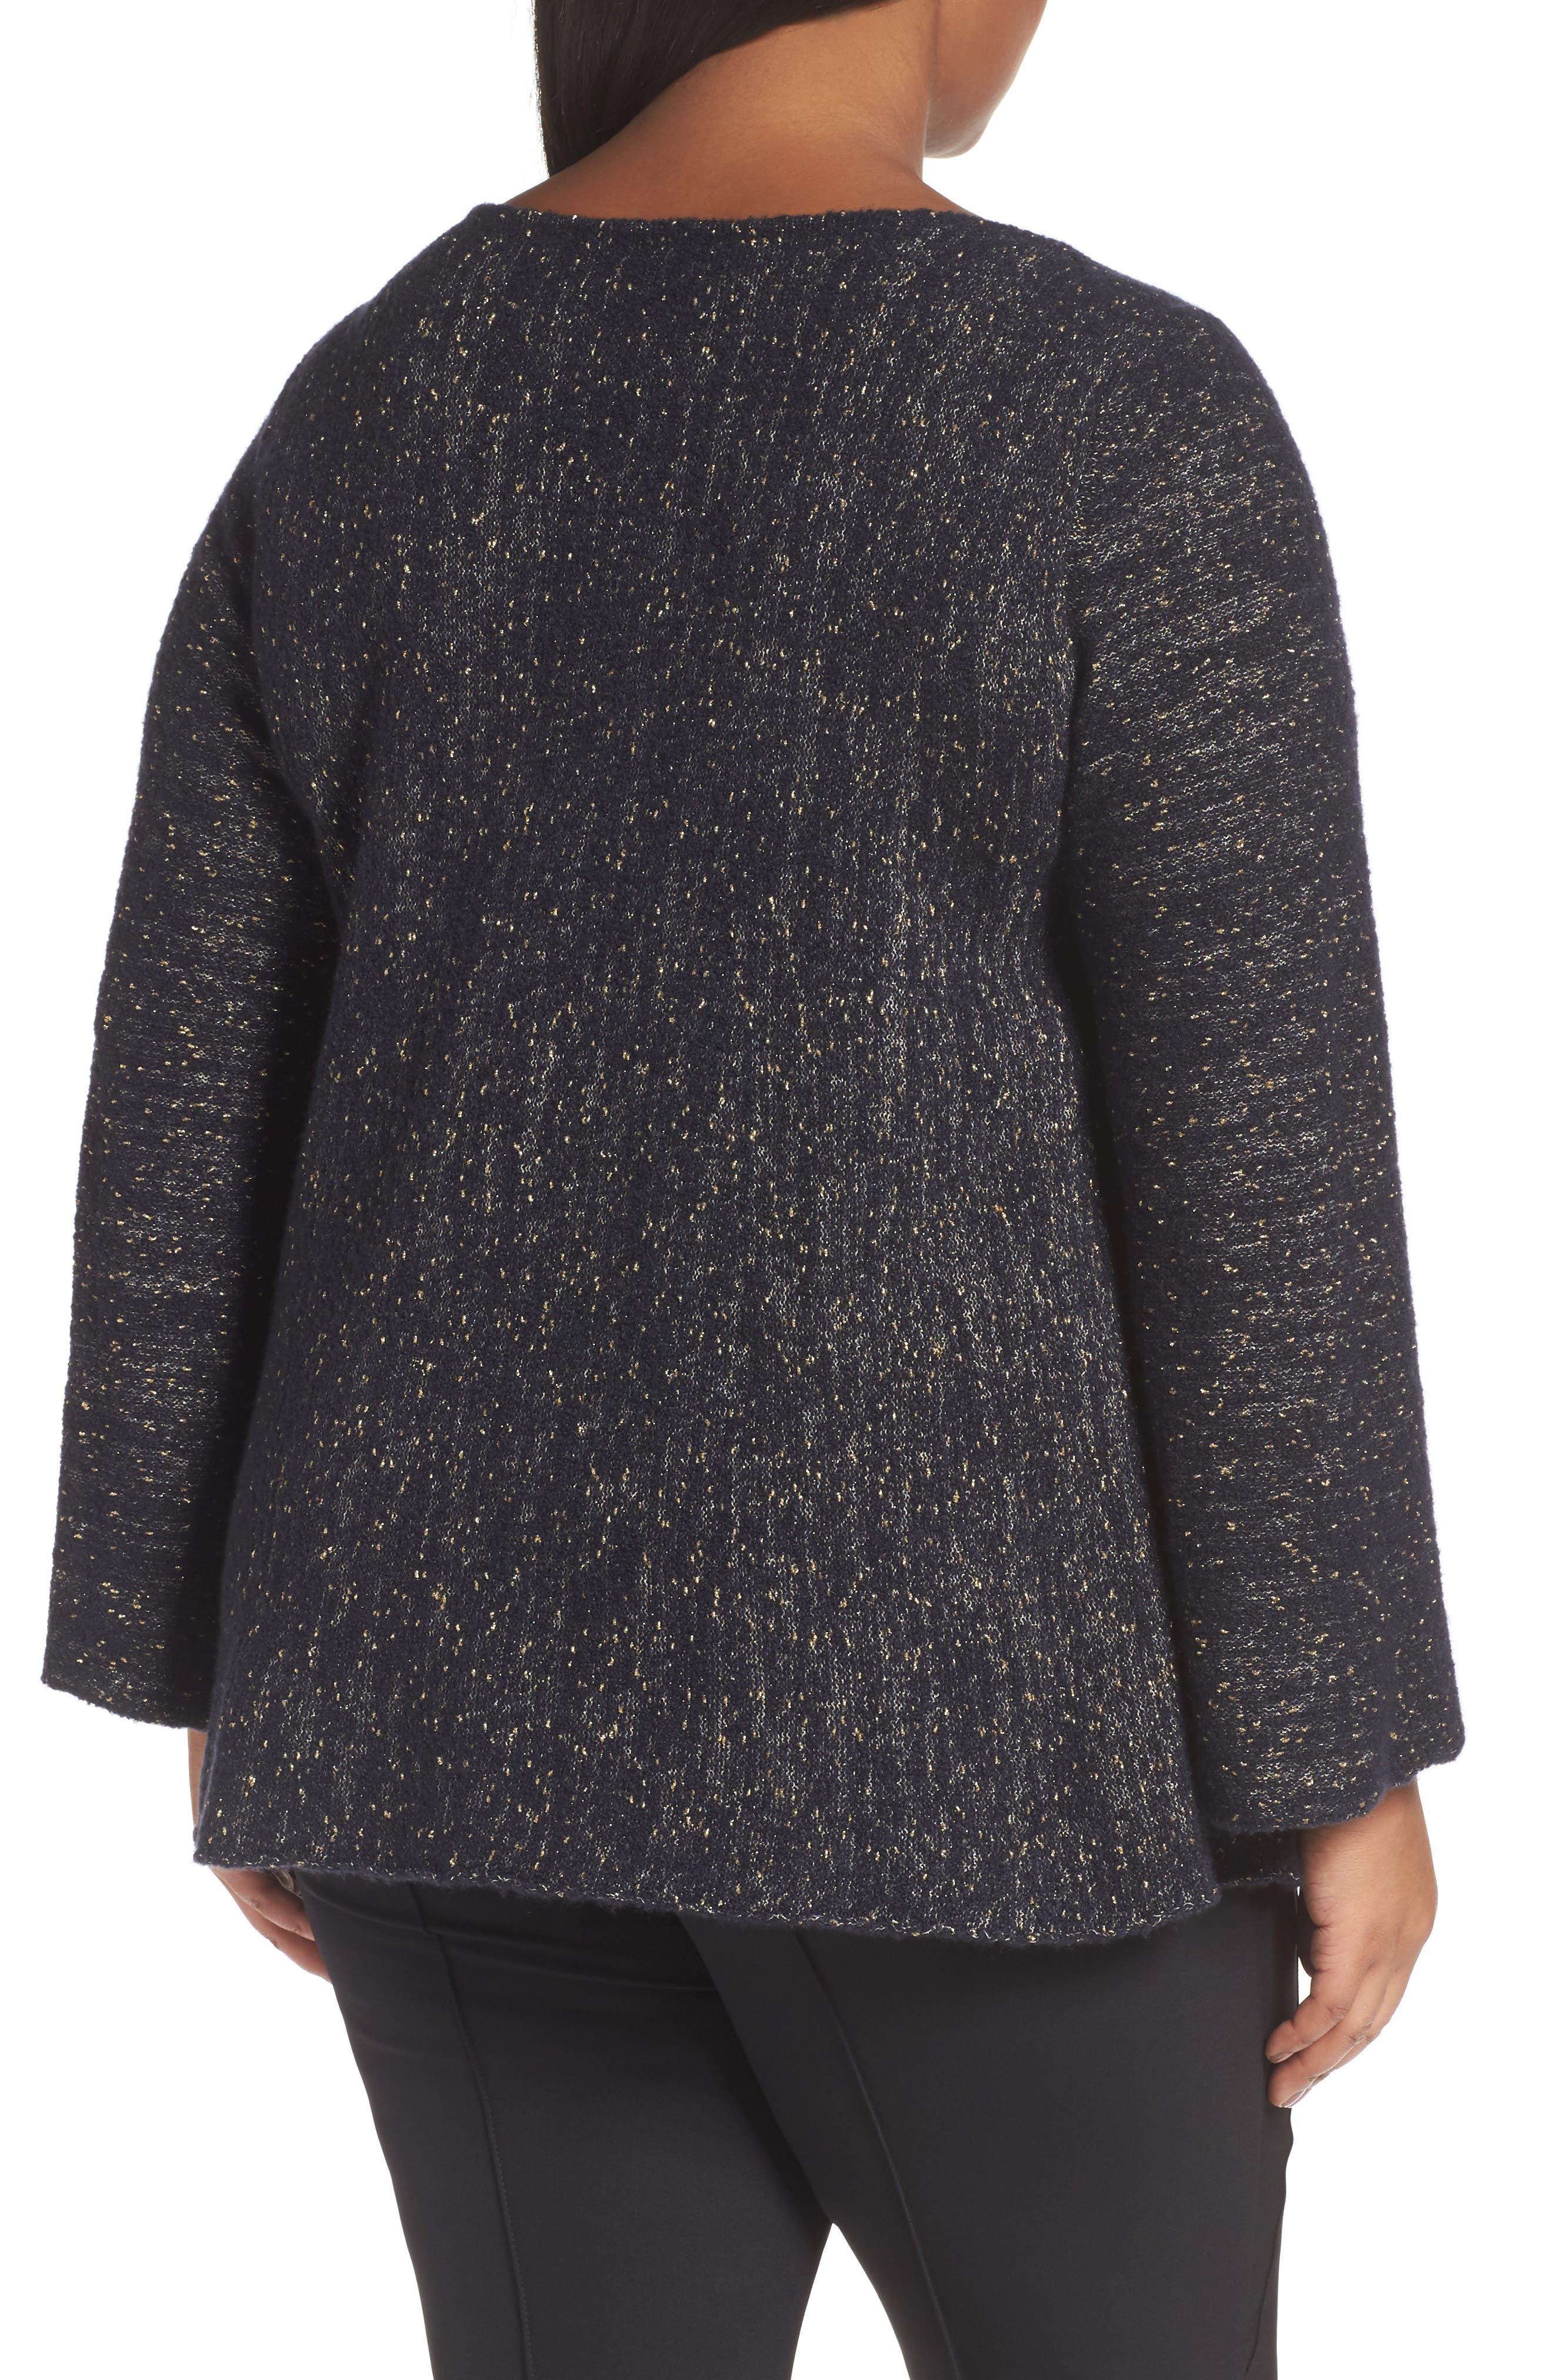 Lafayette 148 Metallic Knit A-Line Sweater,                             Alternate thumbnail 2, color,                             479